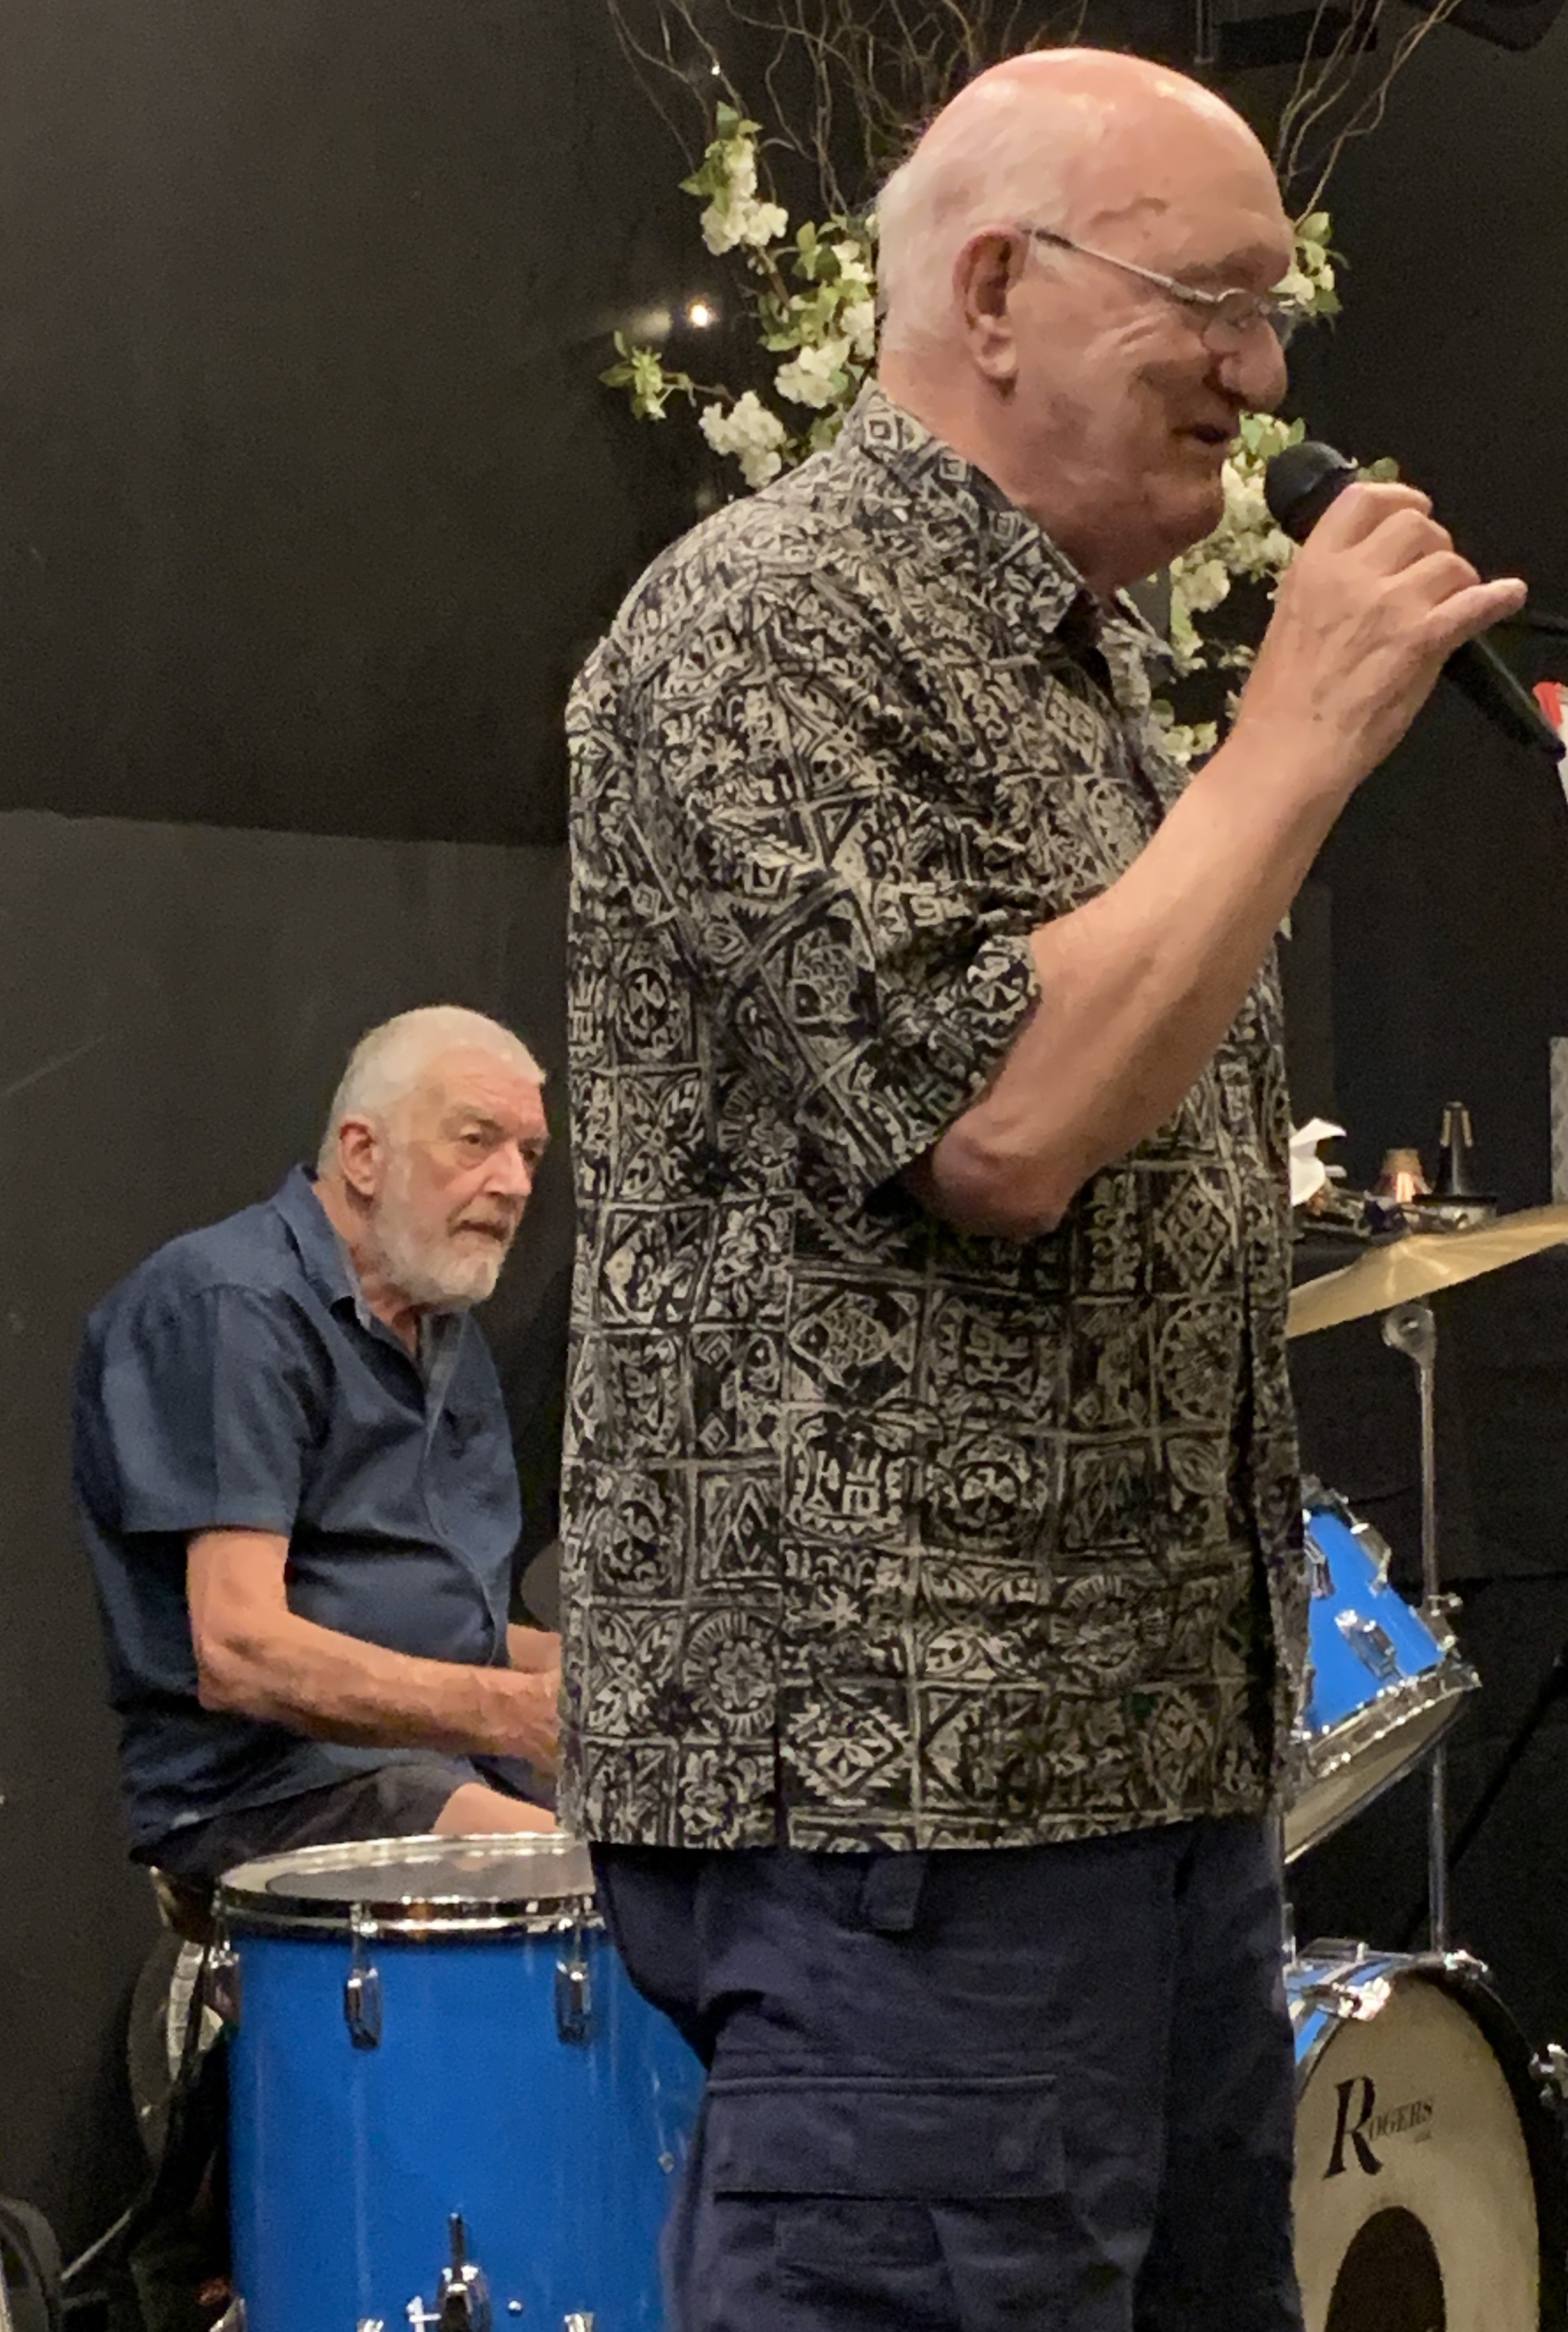 Alan R and Bob W Jan 2019